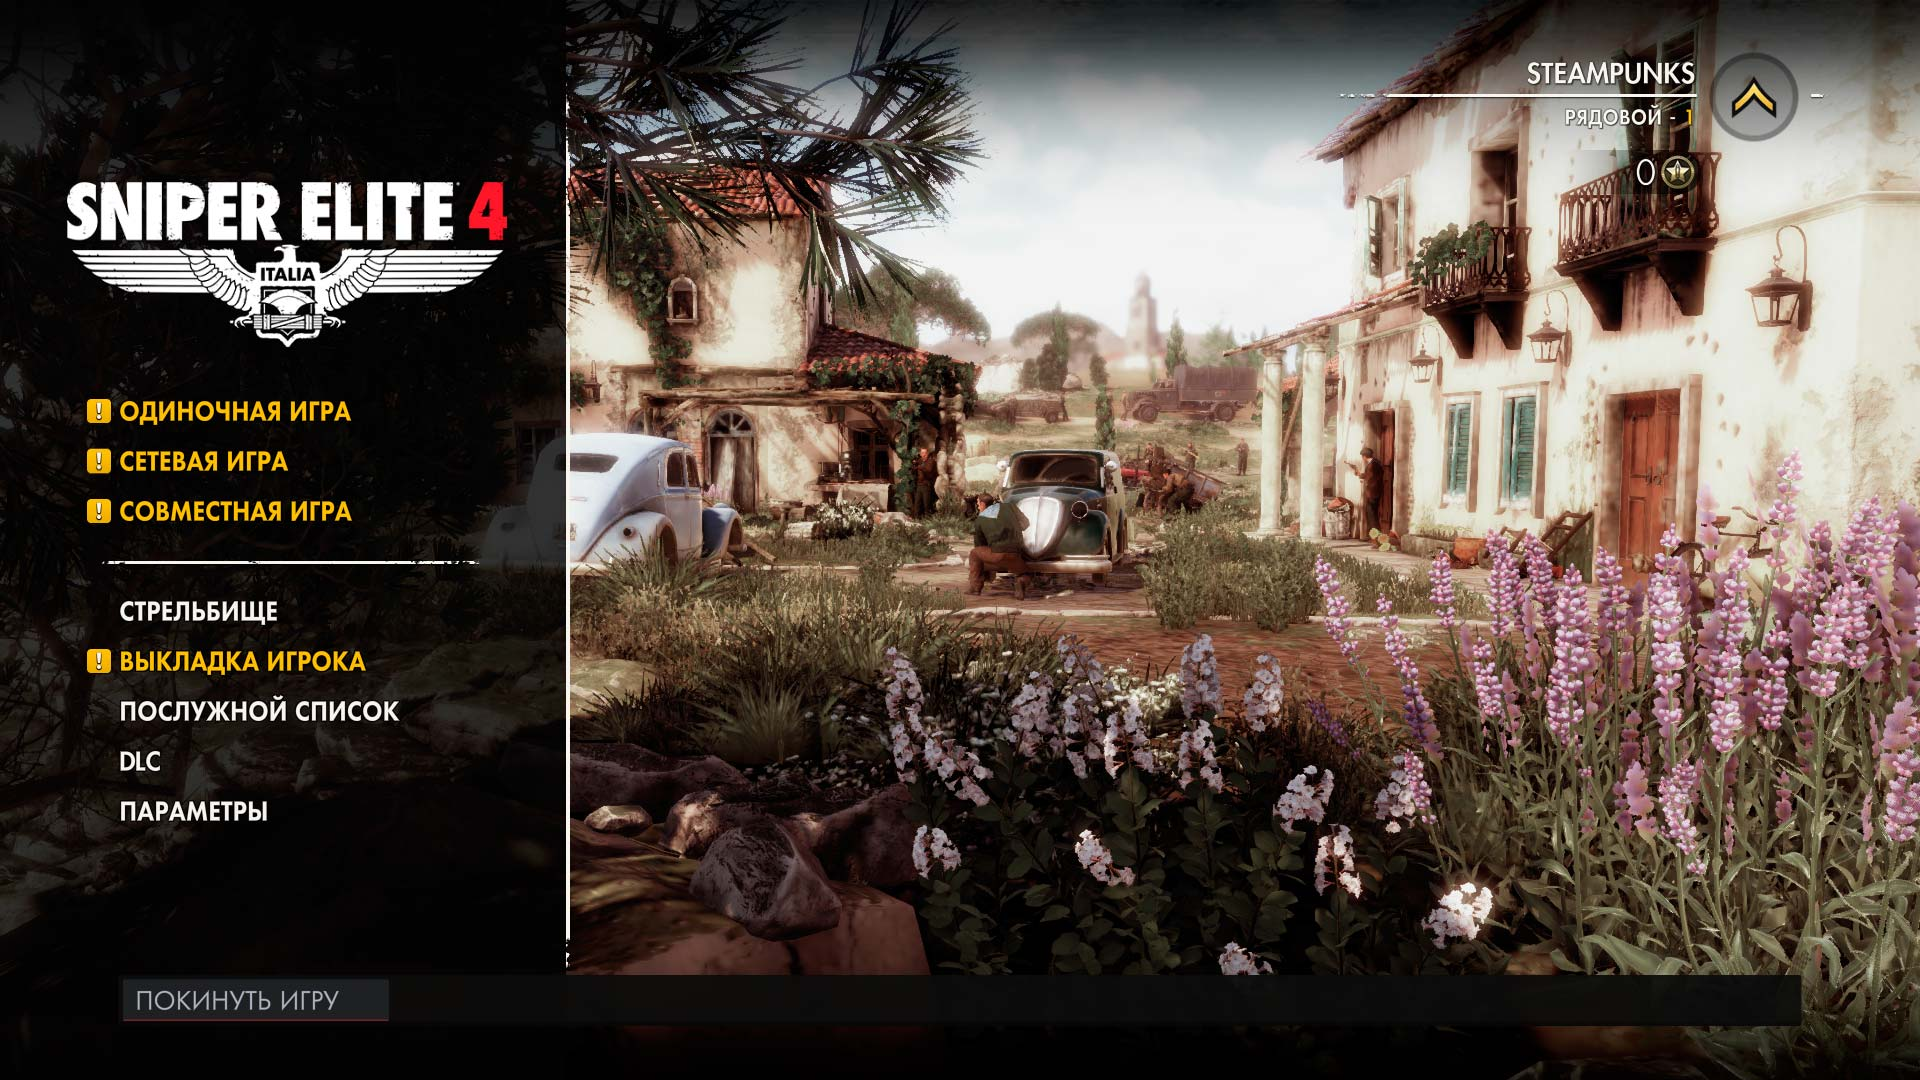 Кряк игры Sniper Elite - картинка 4